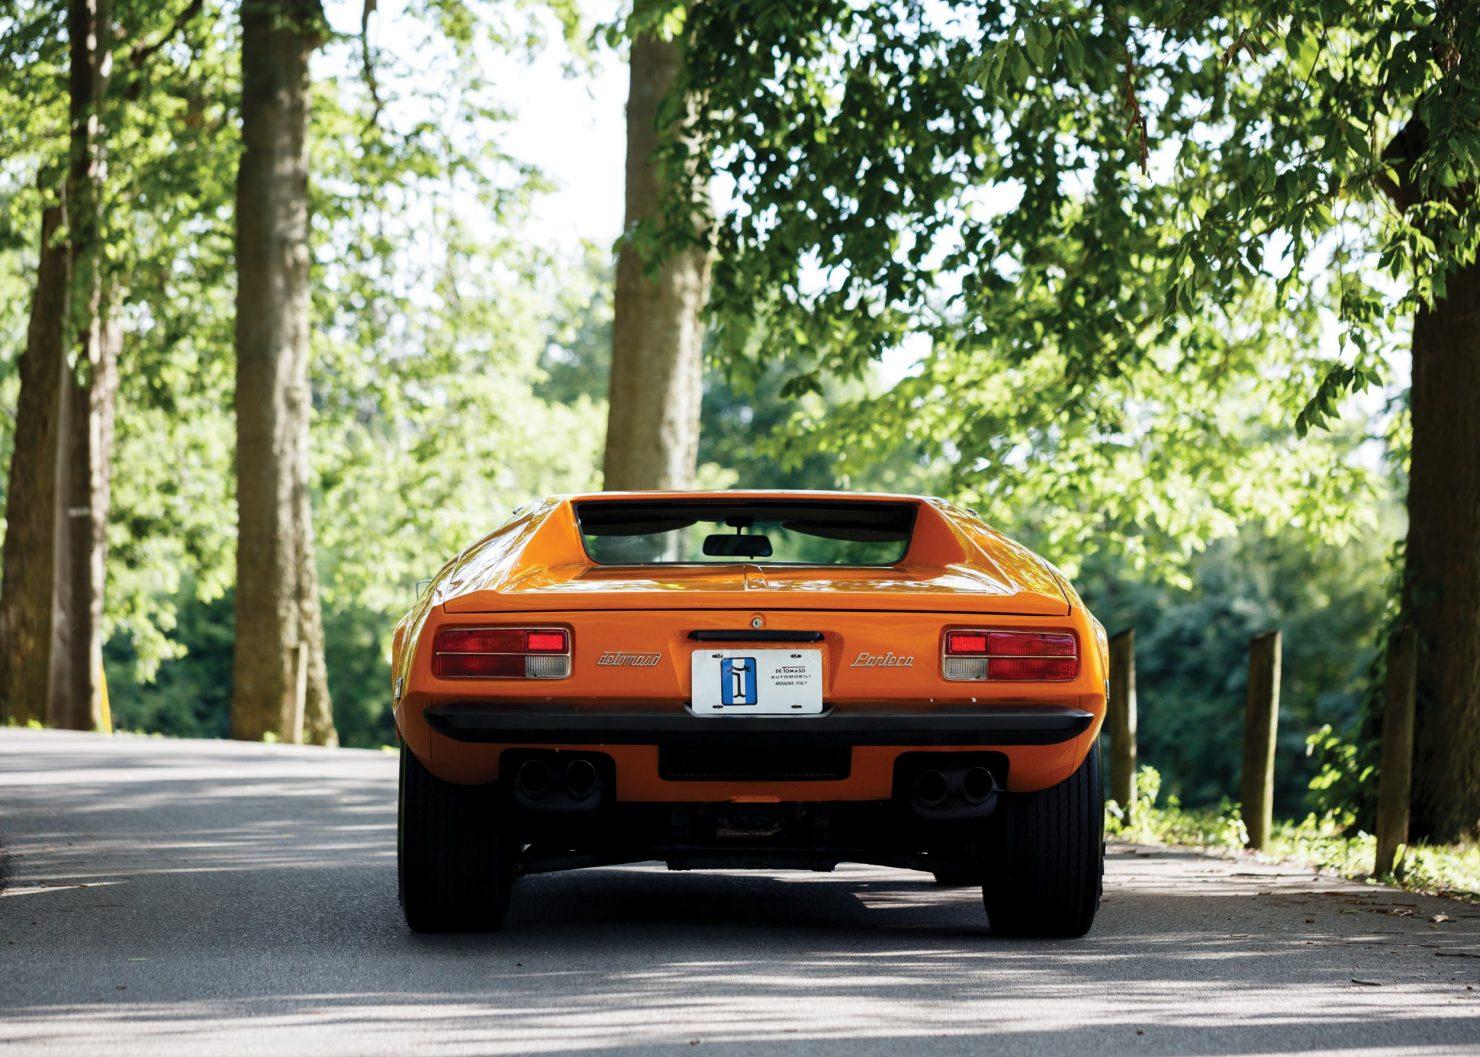 de tomaso pantera 9 1480x1057 - The Last American De Tomaso Pantera